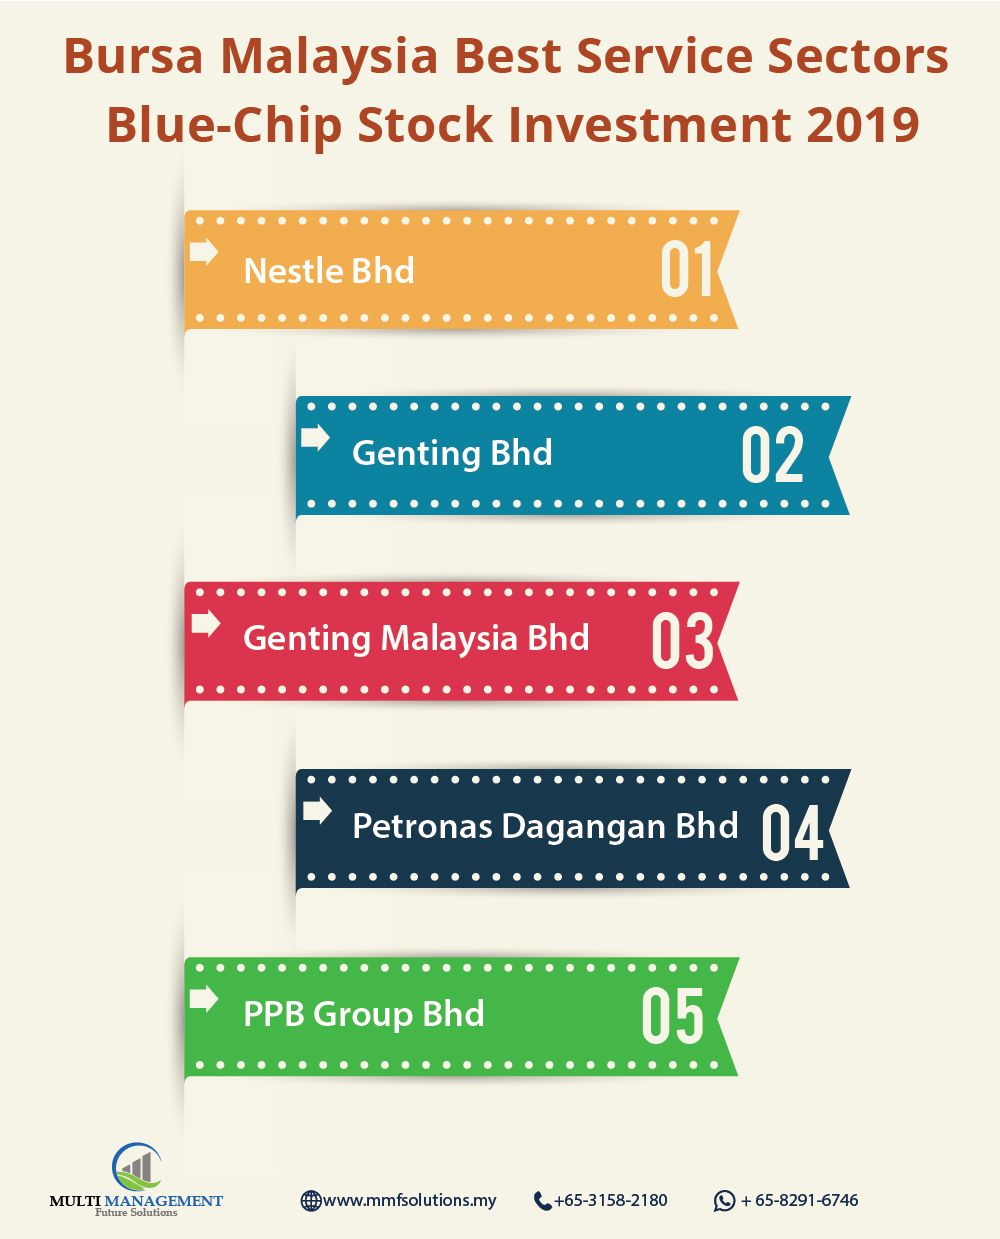 Stockinvestment Bursamalaysia Stock2019 Investing Stock